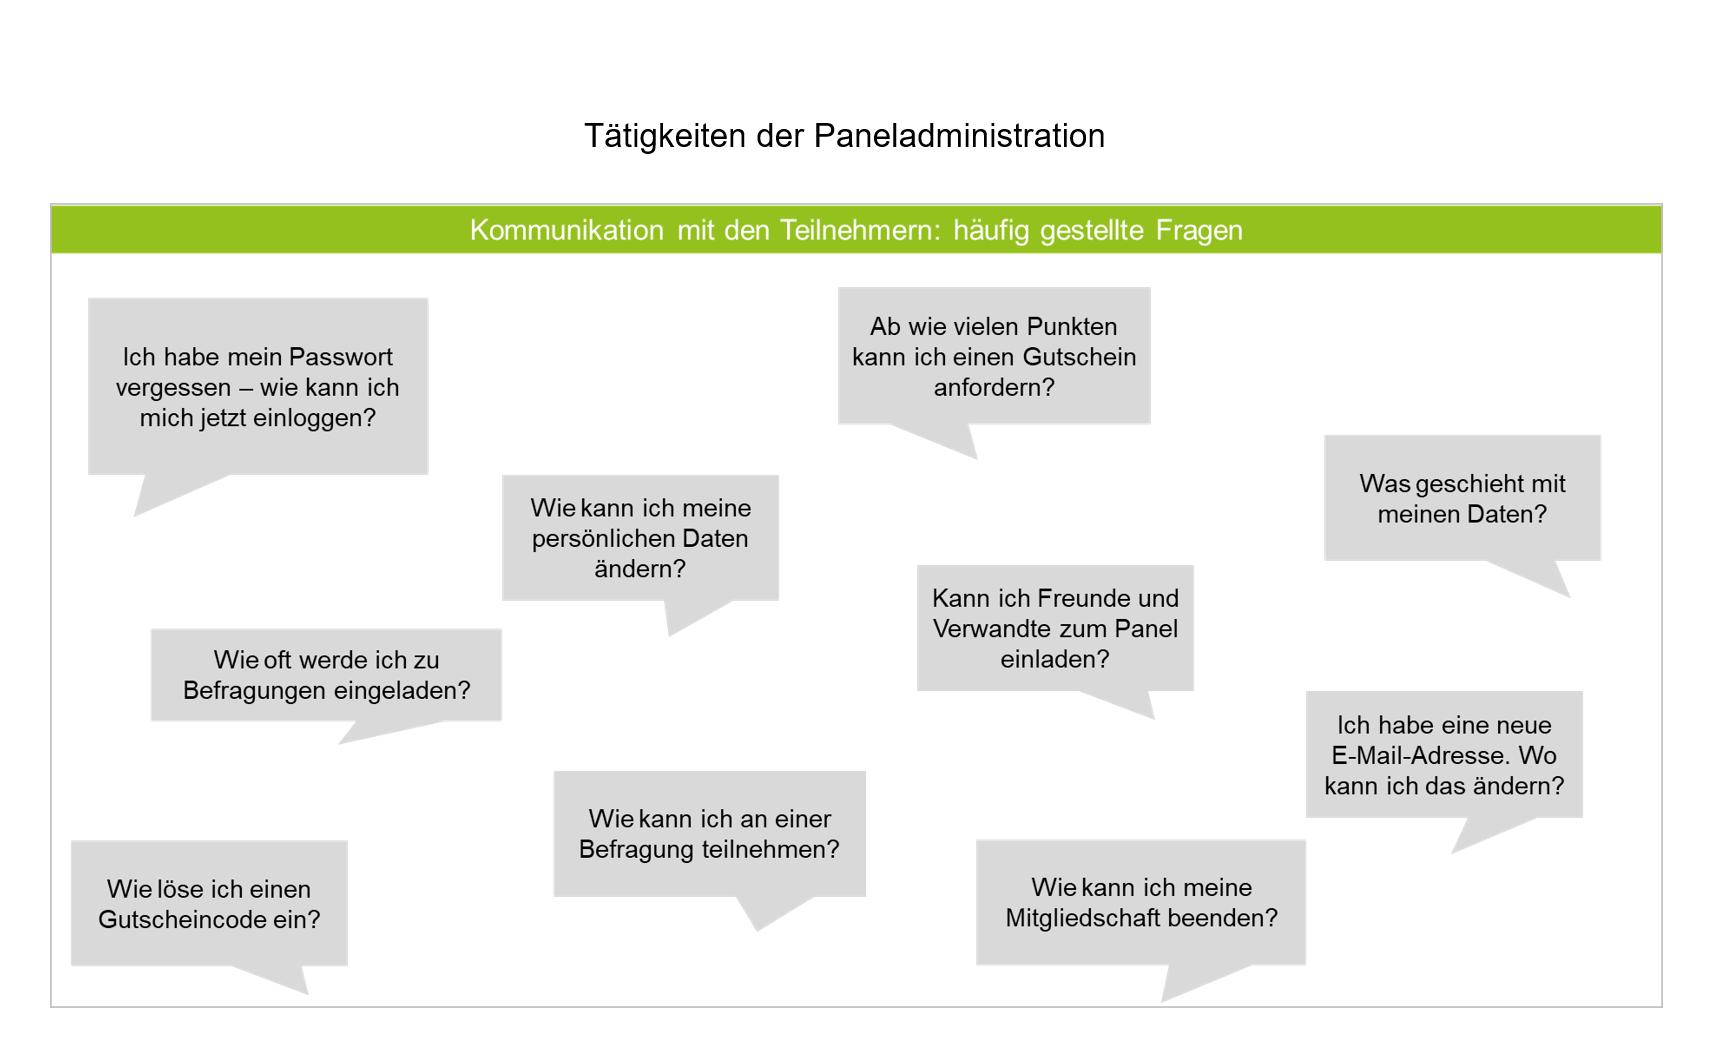 Kommunikation-mit-Teilnehmern im Panel